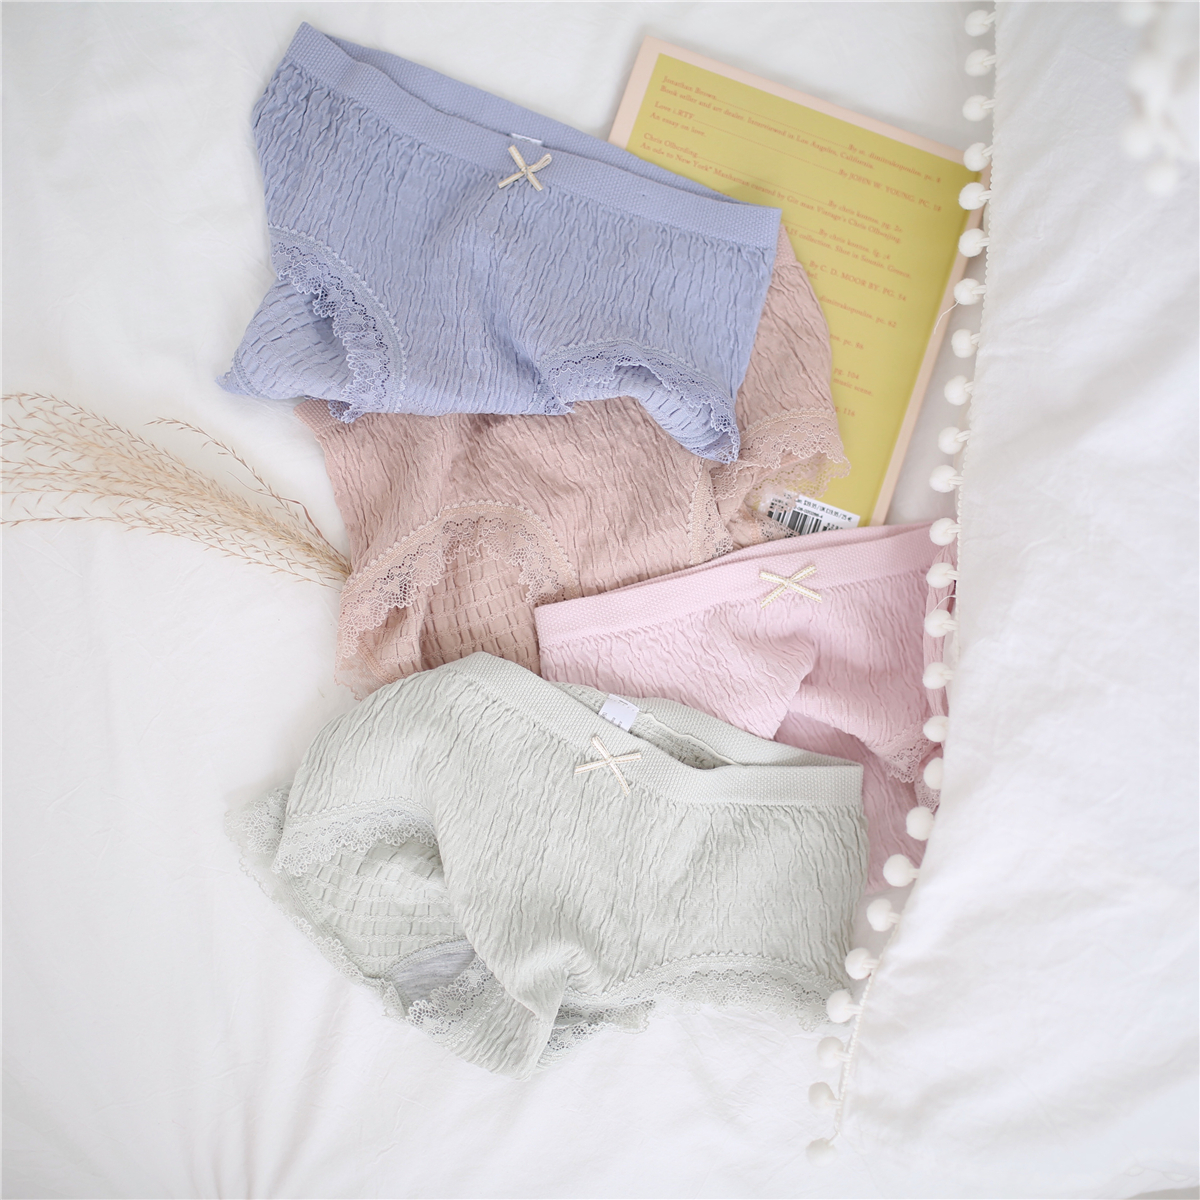 Chao elastic underwear womens briefs womens briefs waist pack buttocks solid color ins wind modal womens underwear wrinkles